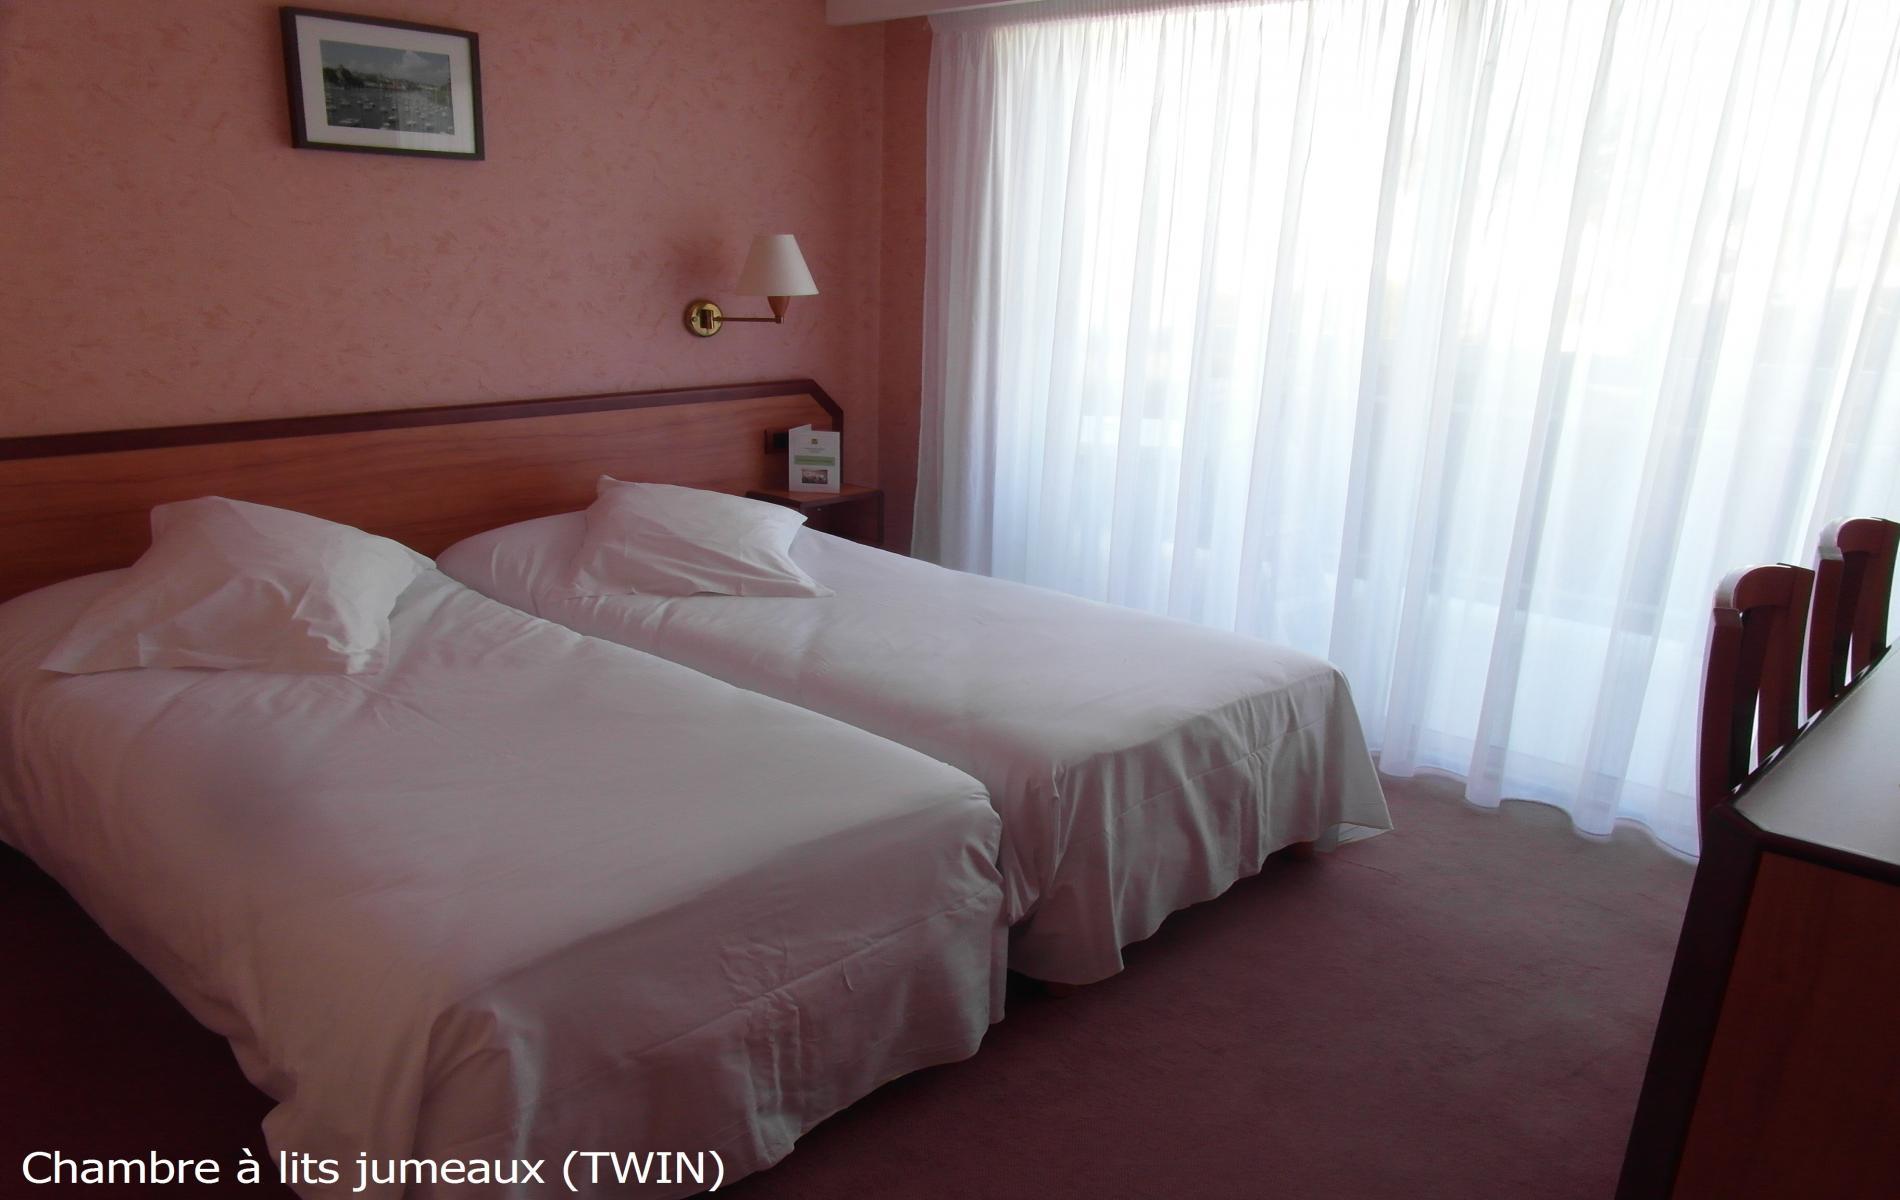 Chambre à lits jumeaux (TWIN)